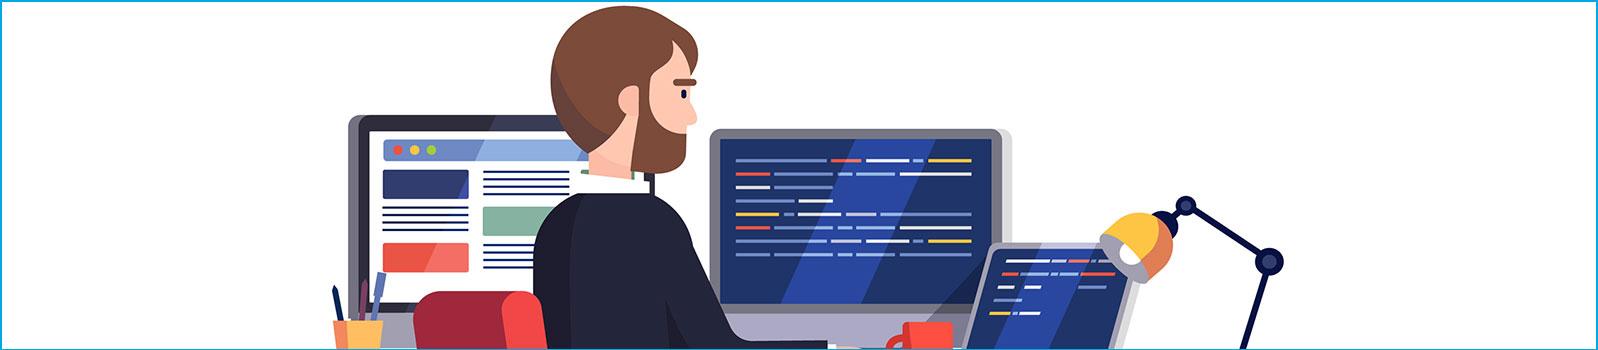 Service Desk Engineer | itContracting